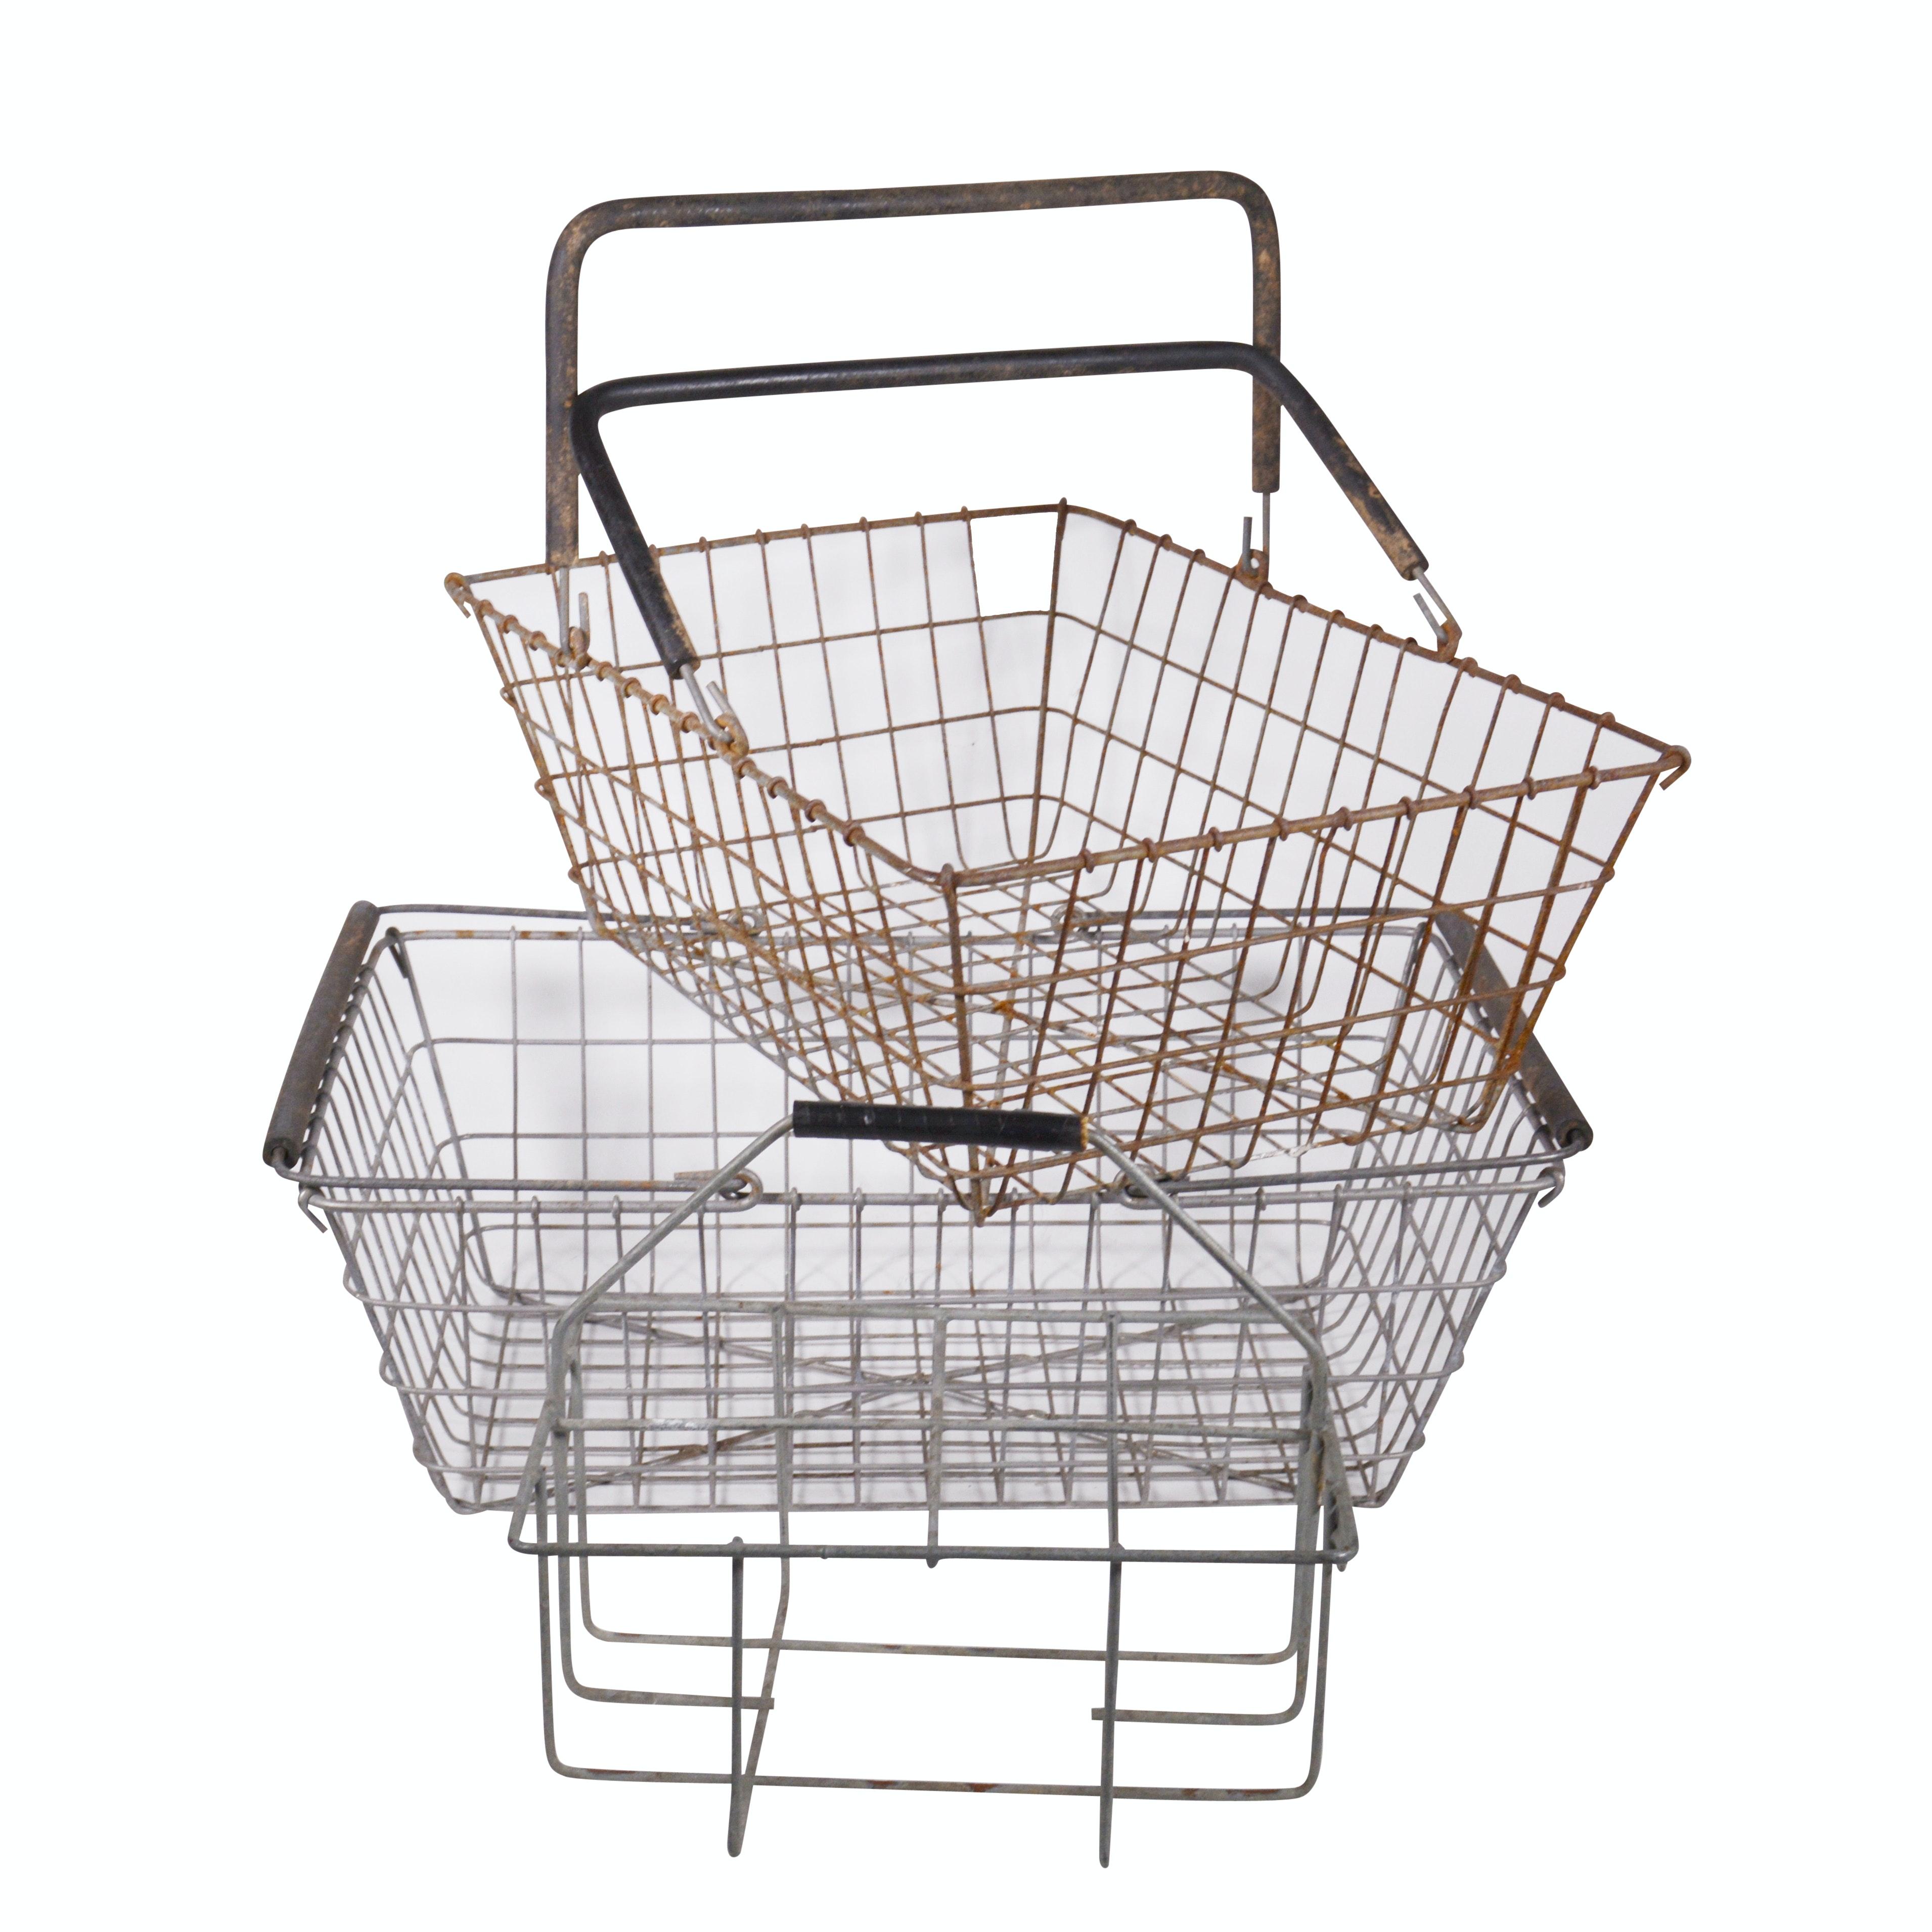 Wire Milk Carrier Basket with Wire Gathering Baskets